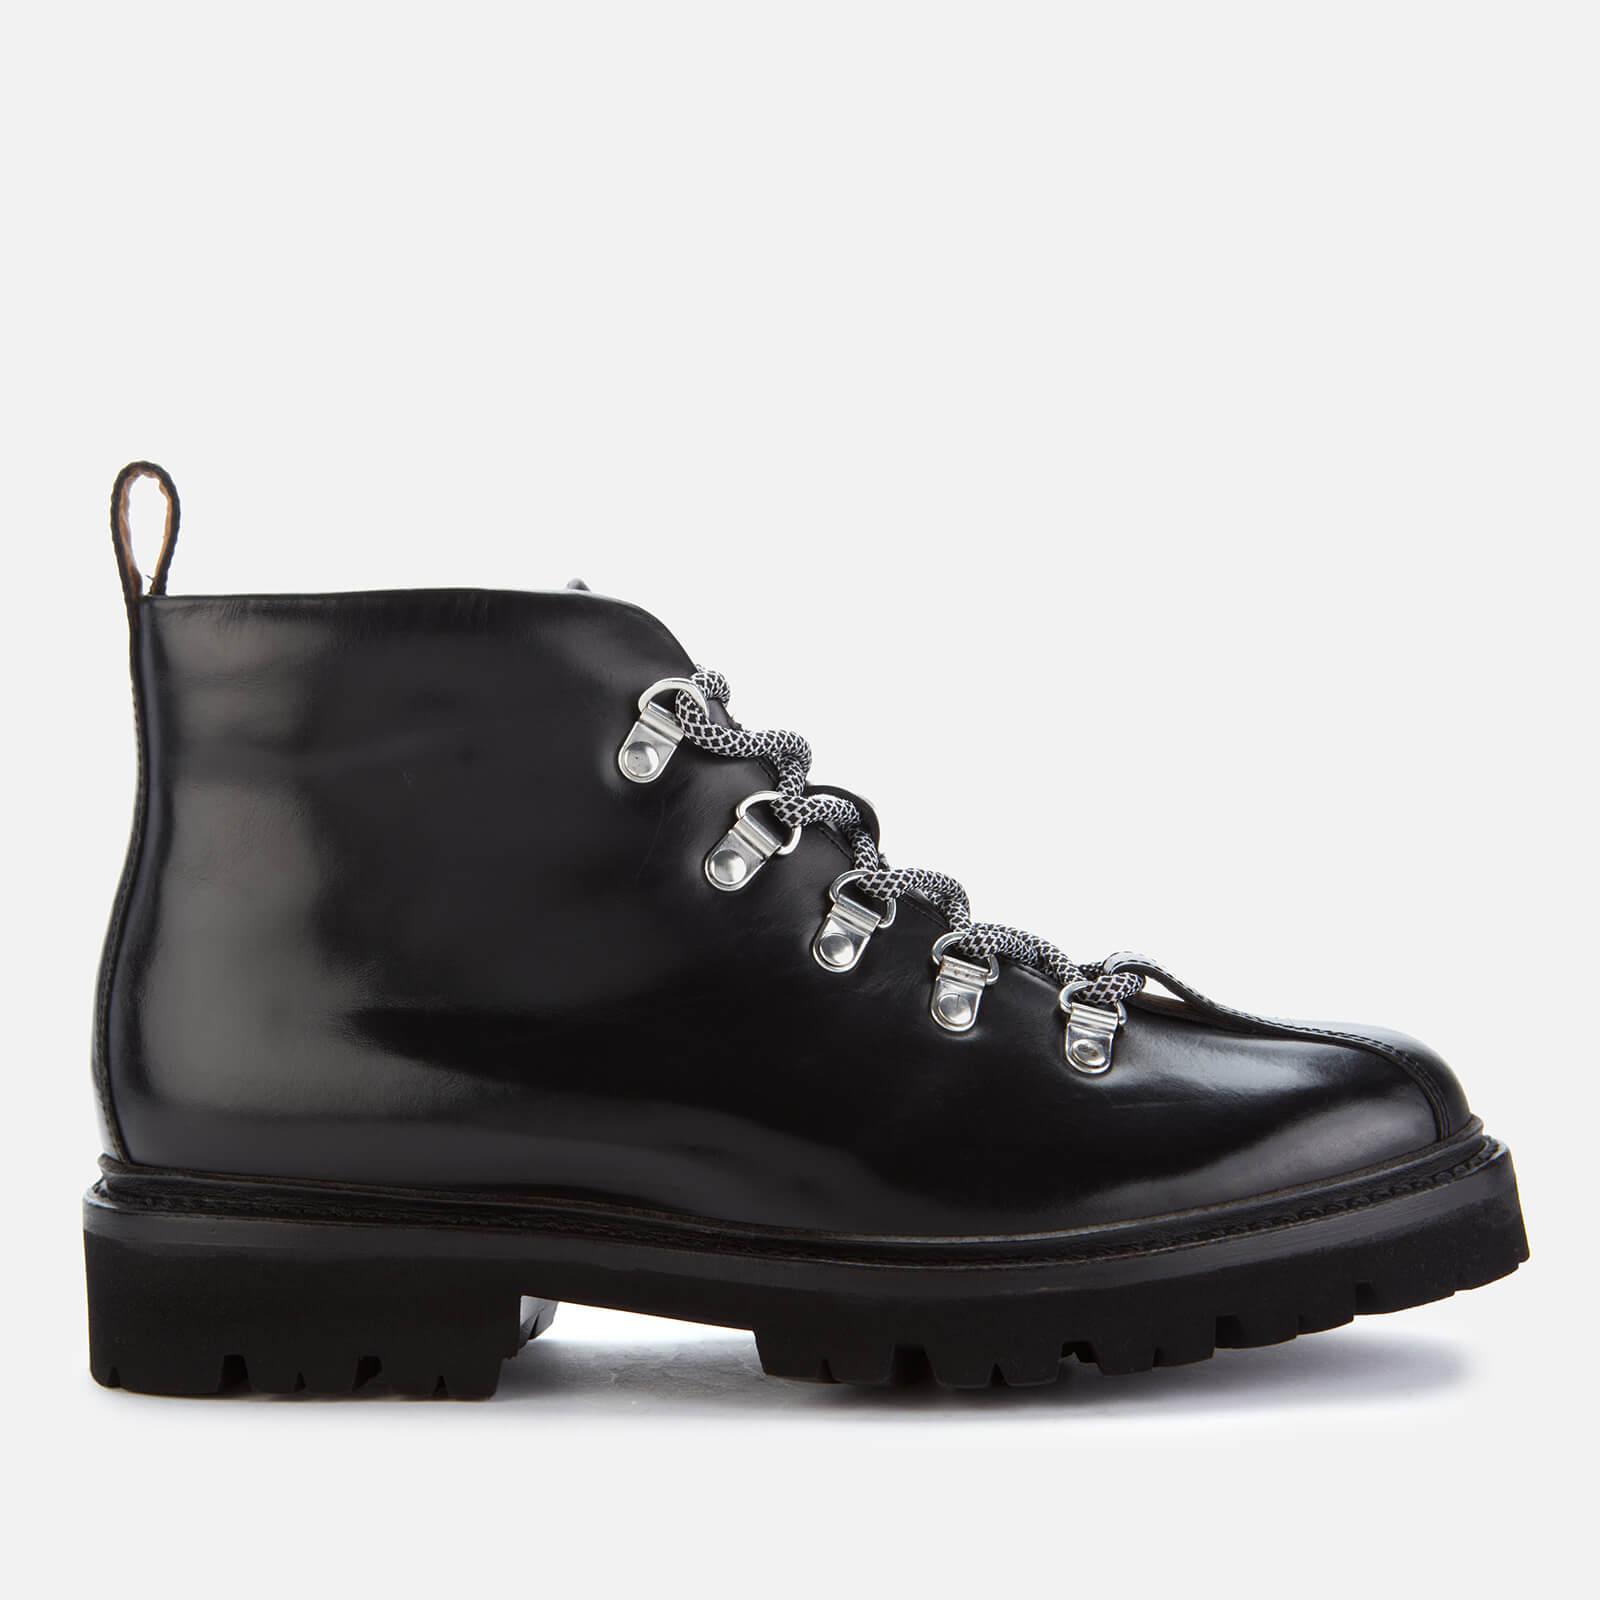 Grenson Women's Bridget Leather Hiking Style Boots - Black